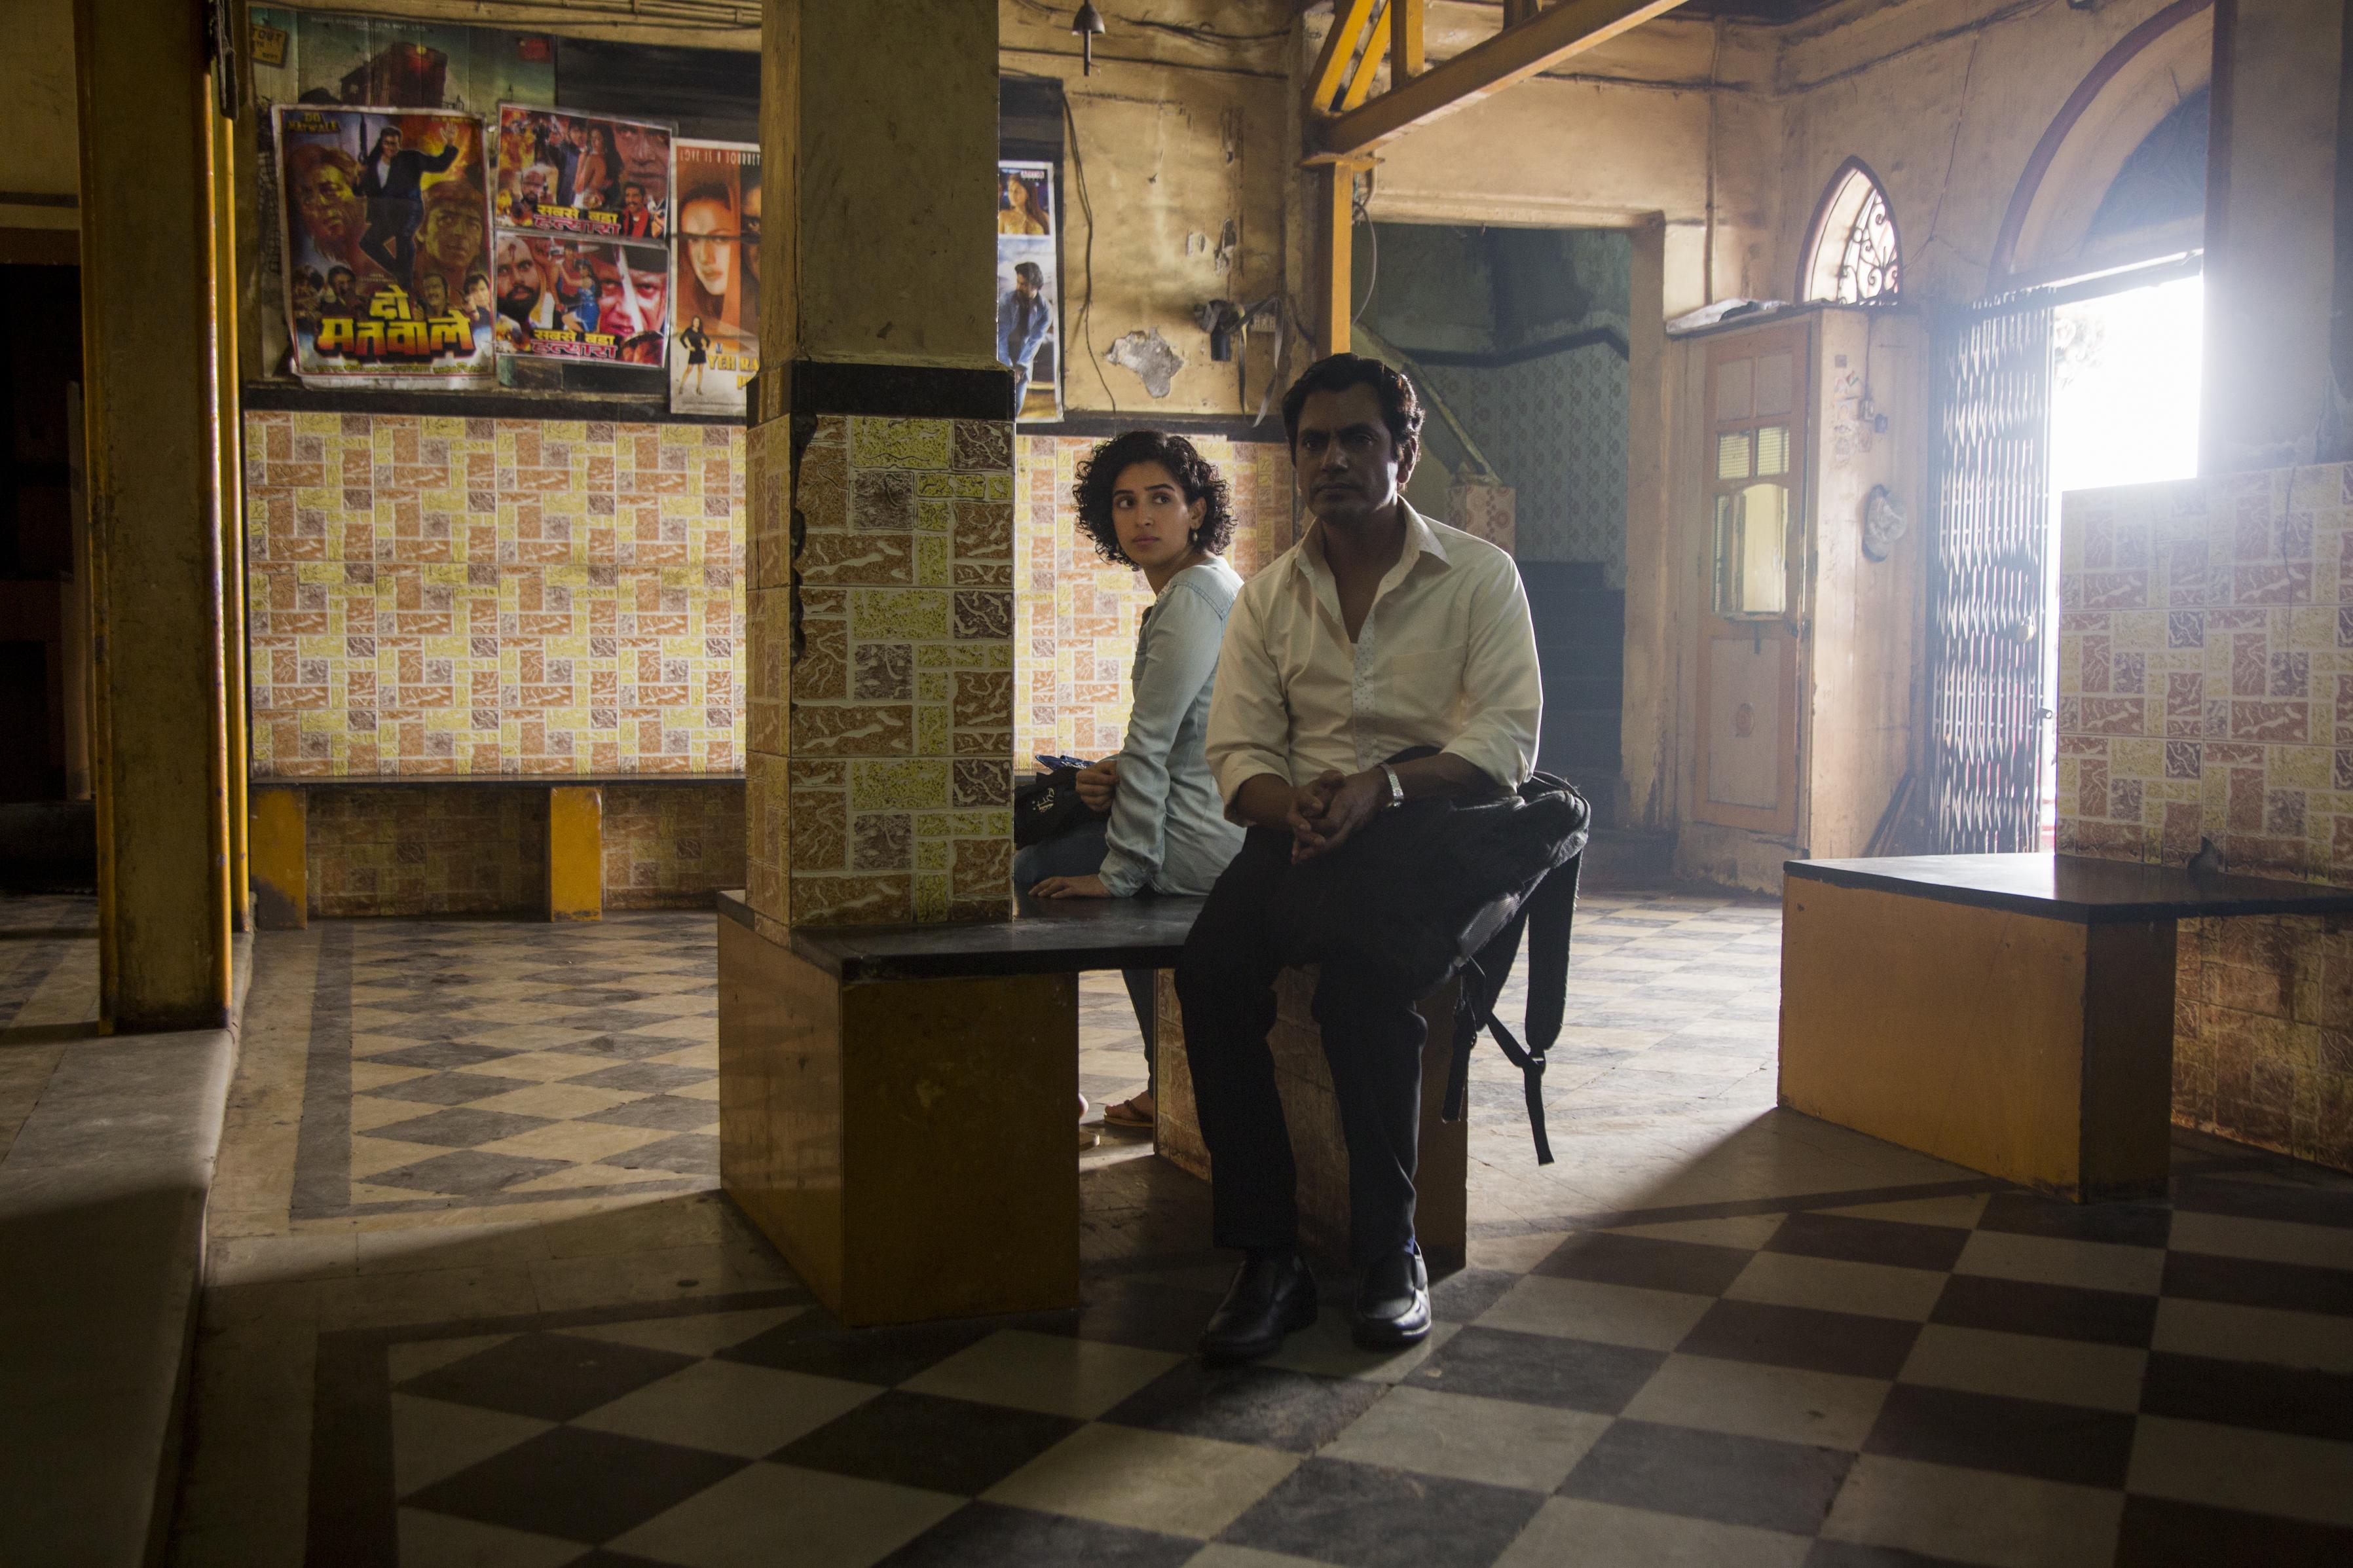 'Photograph' Captures Romance Blossoming Across Mumbai's Class Divide